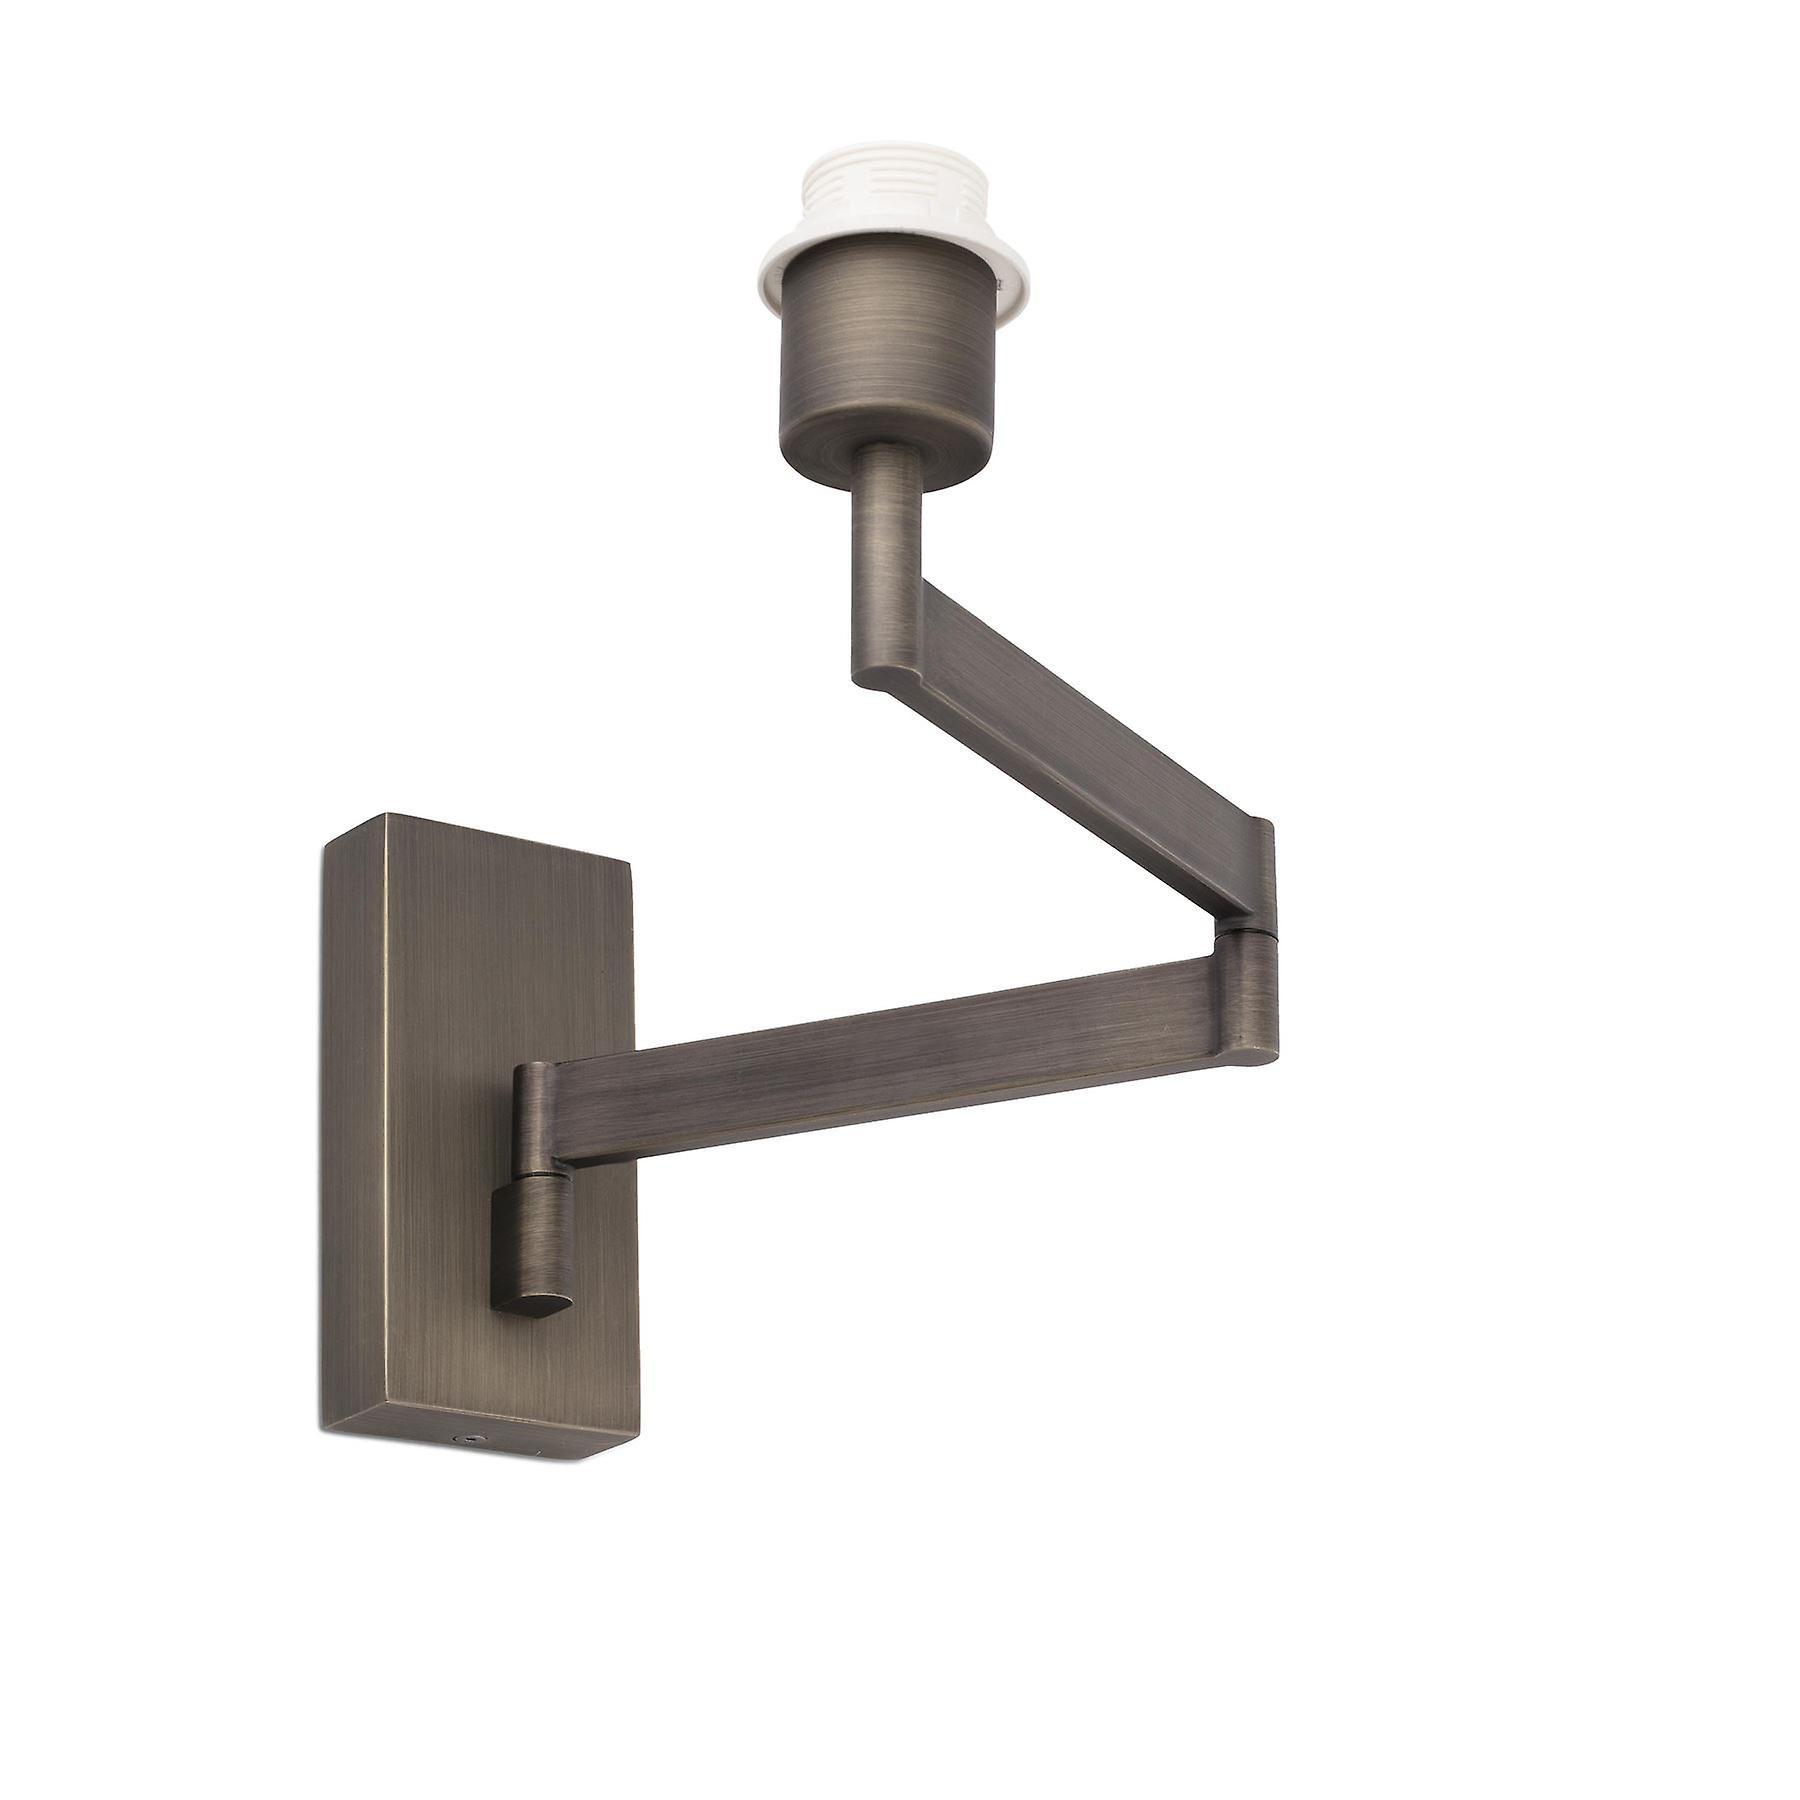 Faro - Artis Bronze Adjustable Wall Lamp- Shade Not Included FARO68494